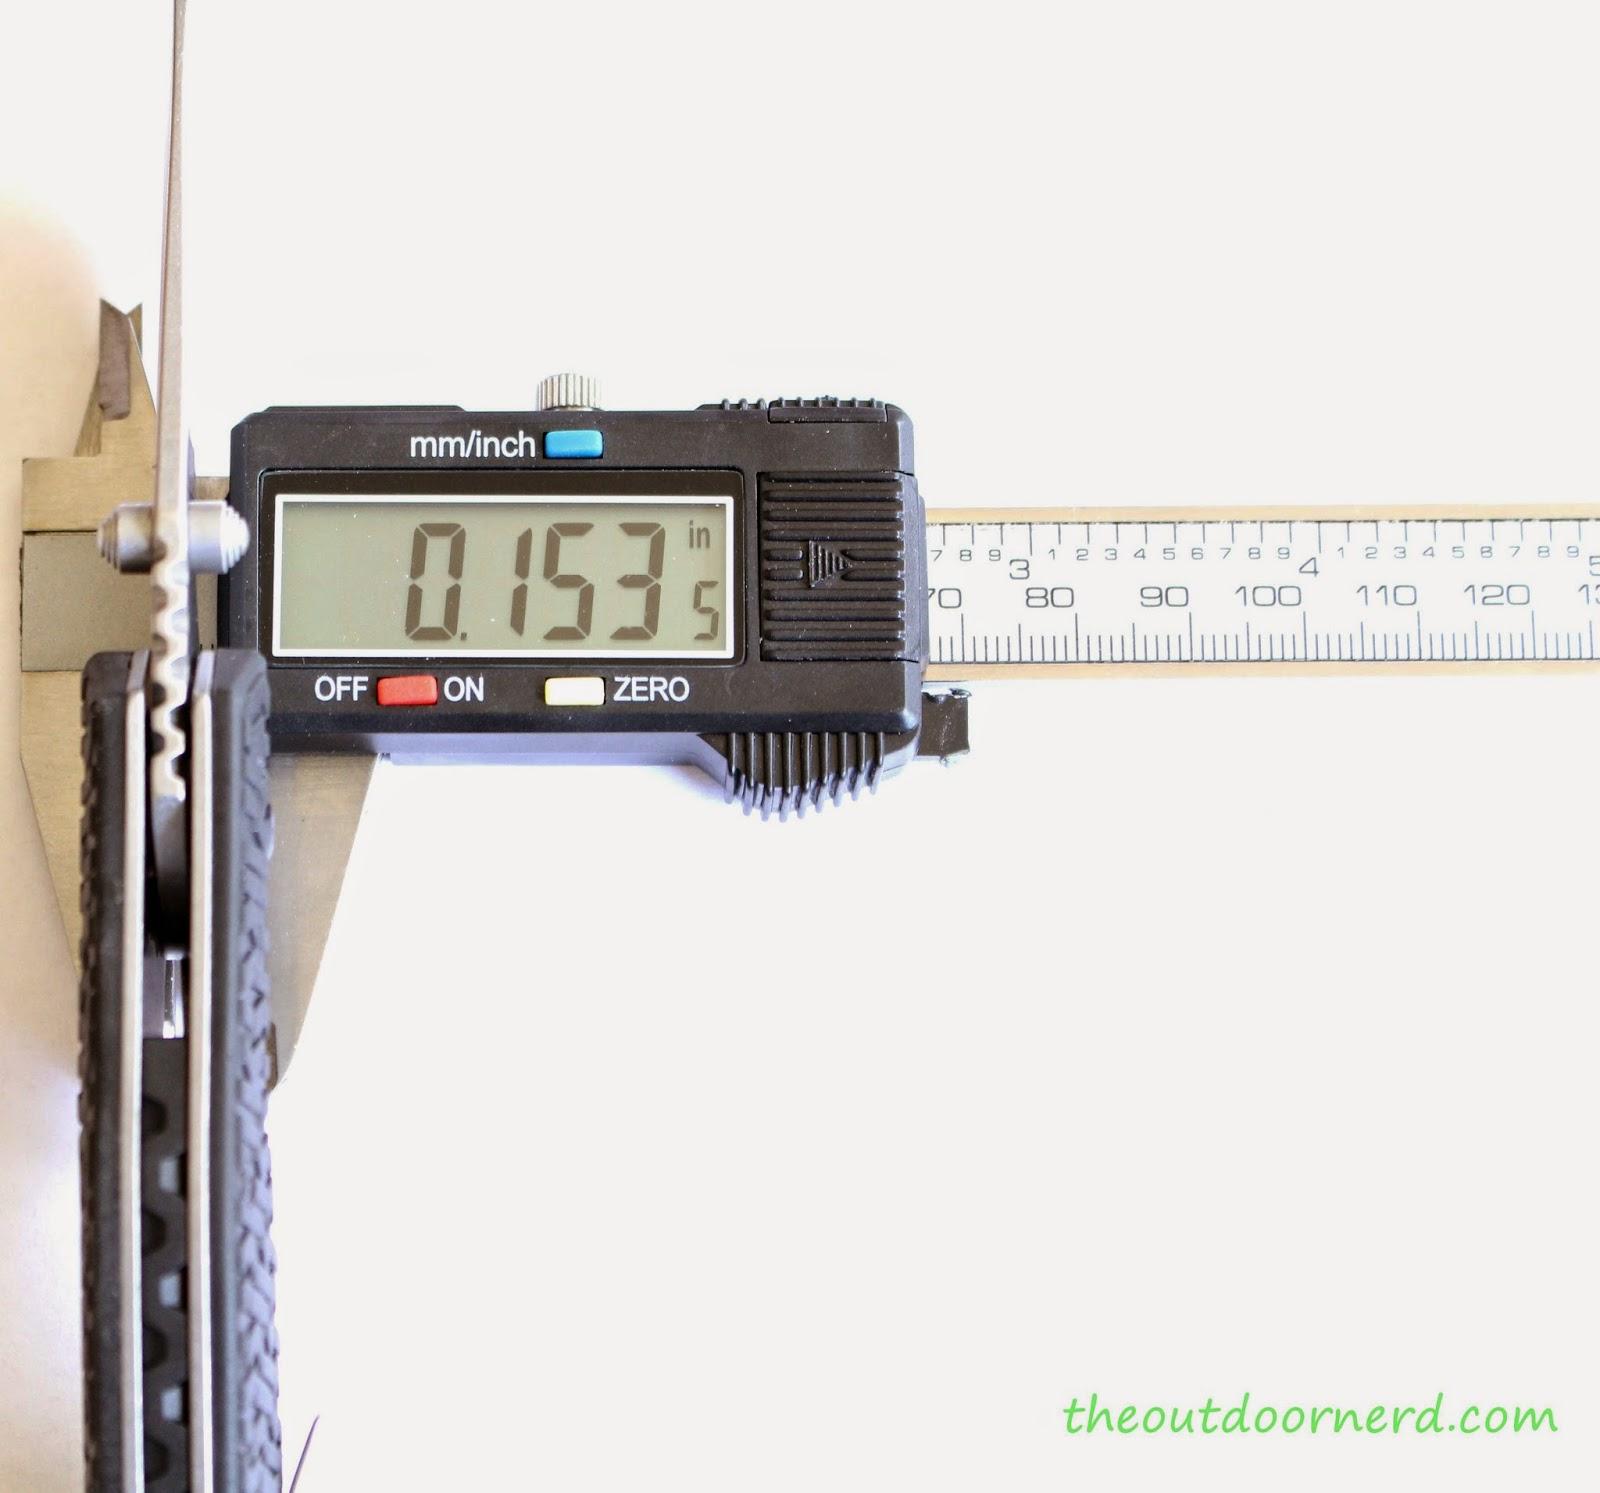 Kershaw Swerve EDC Pocket Knife: Caliper Measurement 1